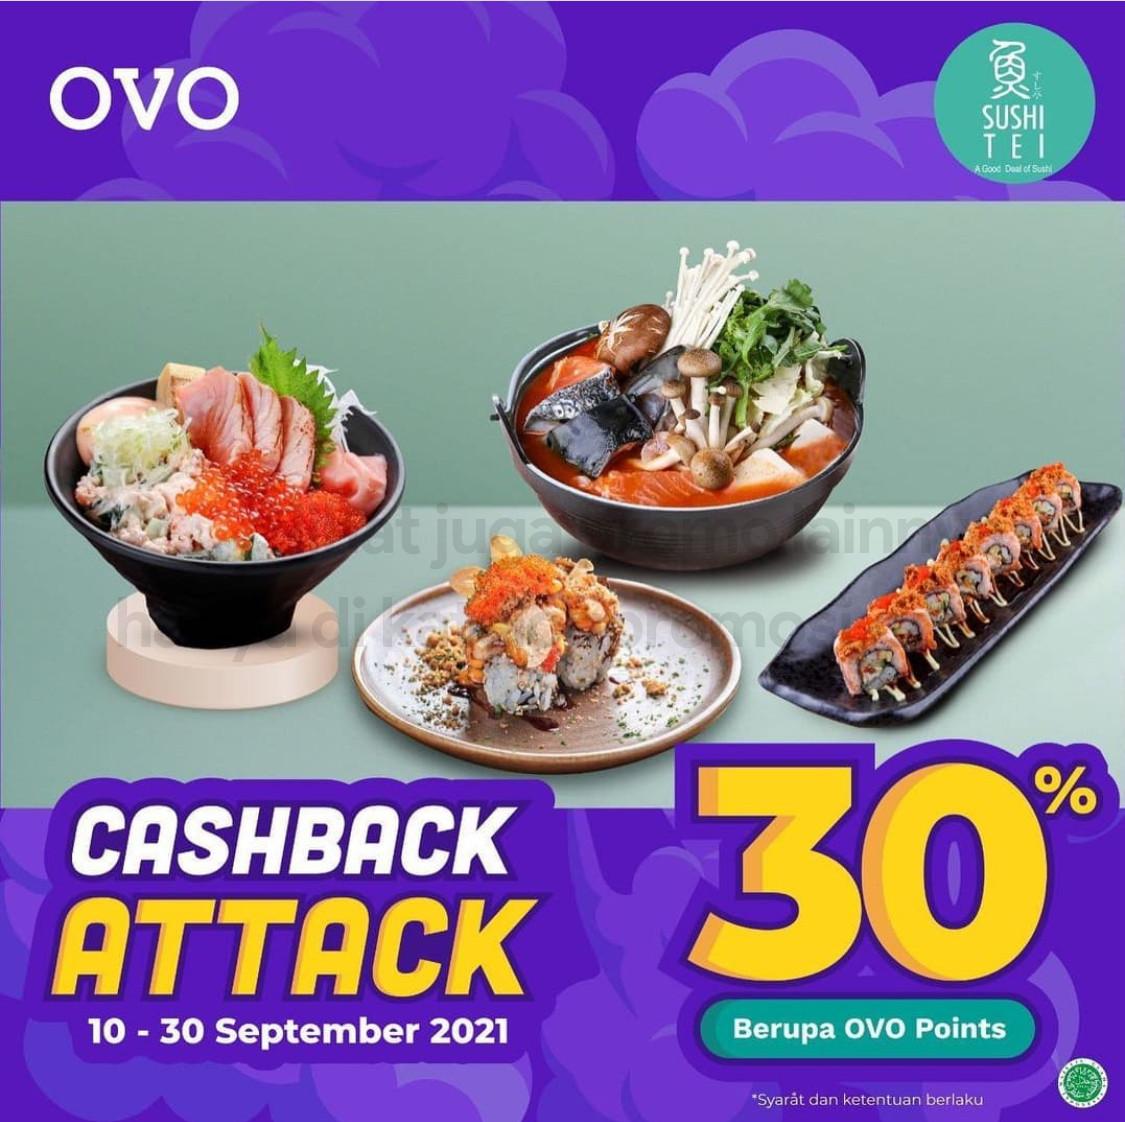 SUSHI TEI Promo OVO CASHBACK ATTACK – Dapatkan Cashback Hingga 30% OVO Points